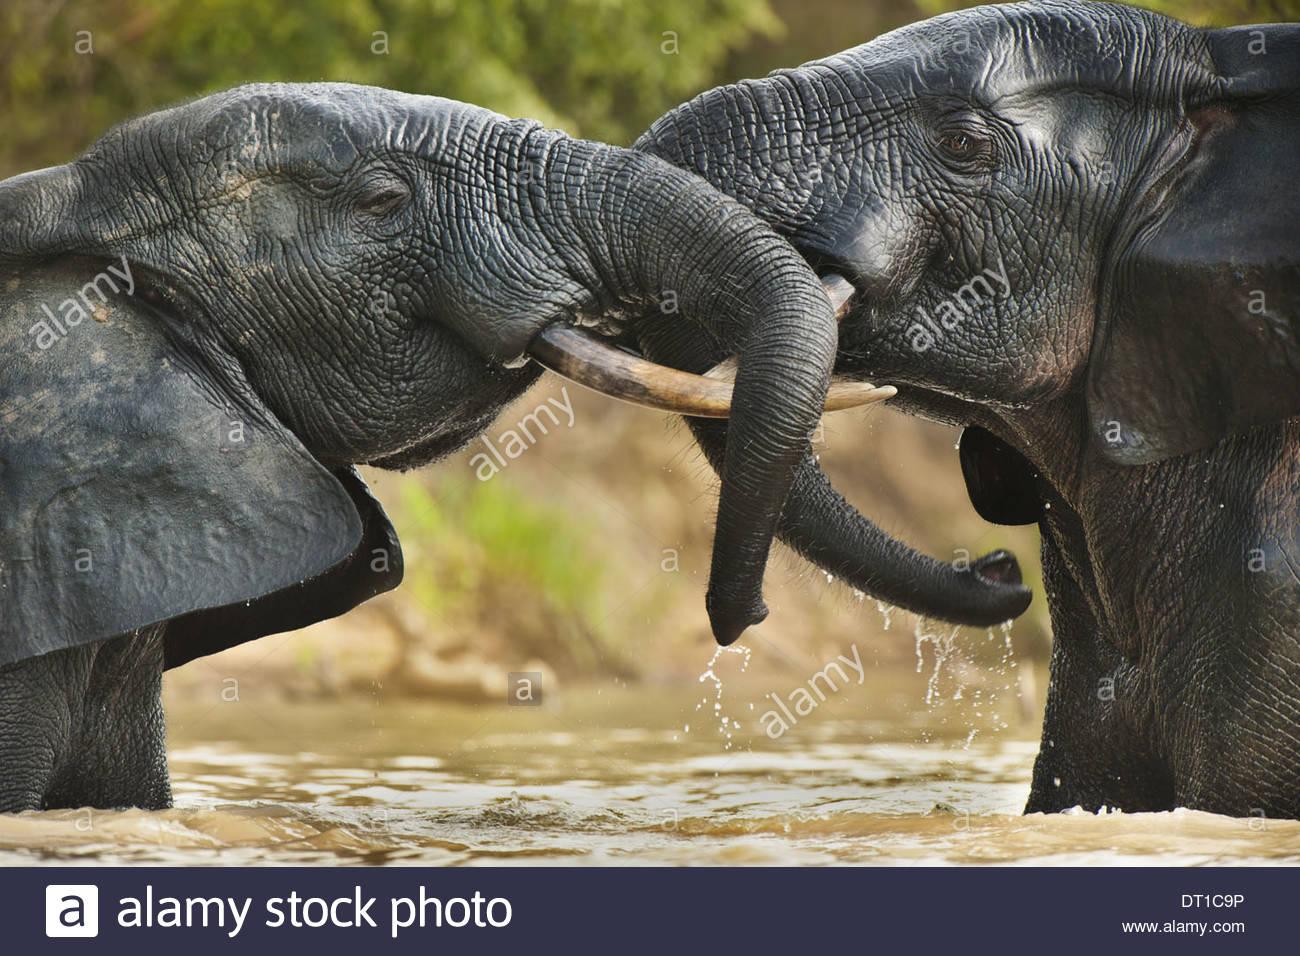 Mole National Park Ghana Elephant bulls two adult agressive confrontation - Stock Image